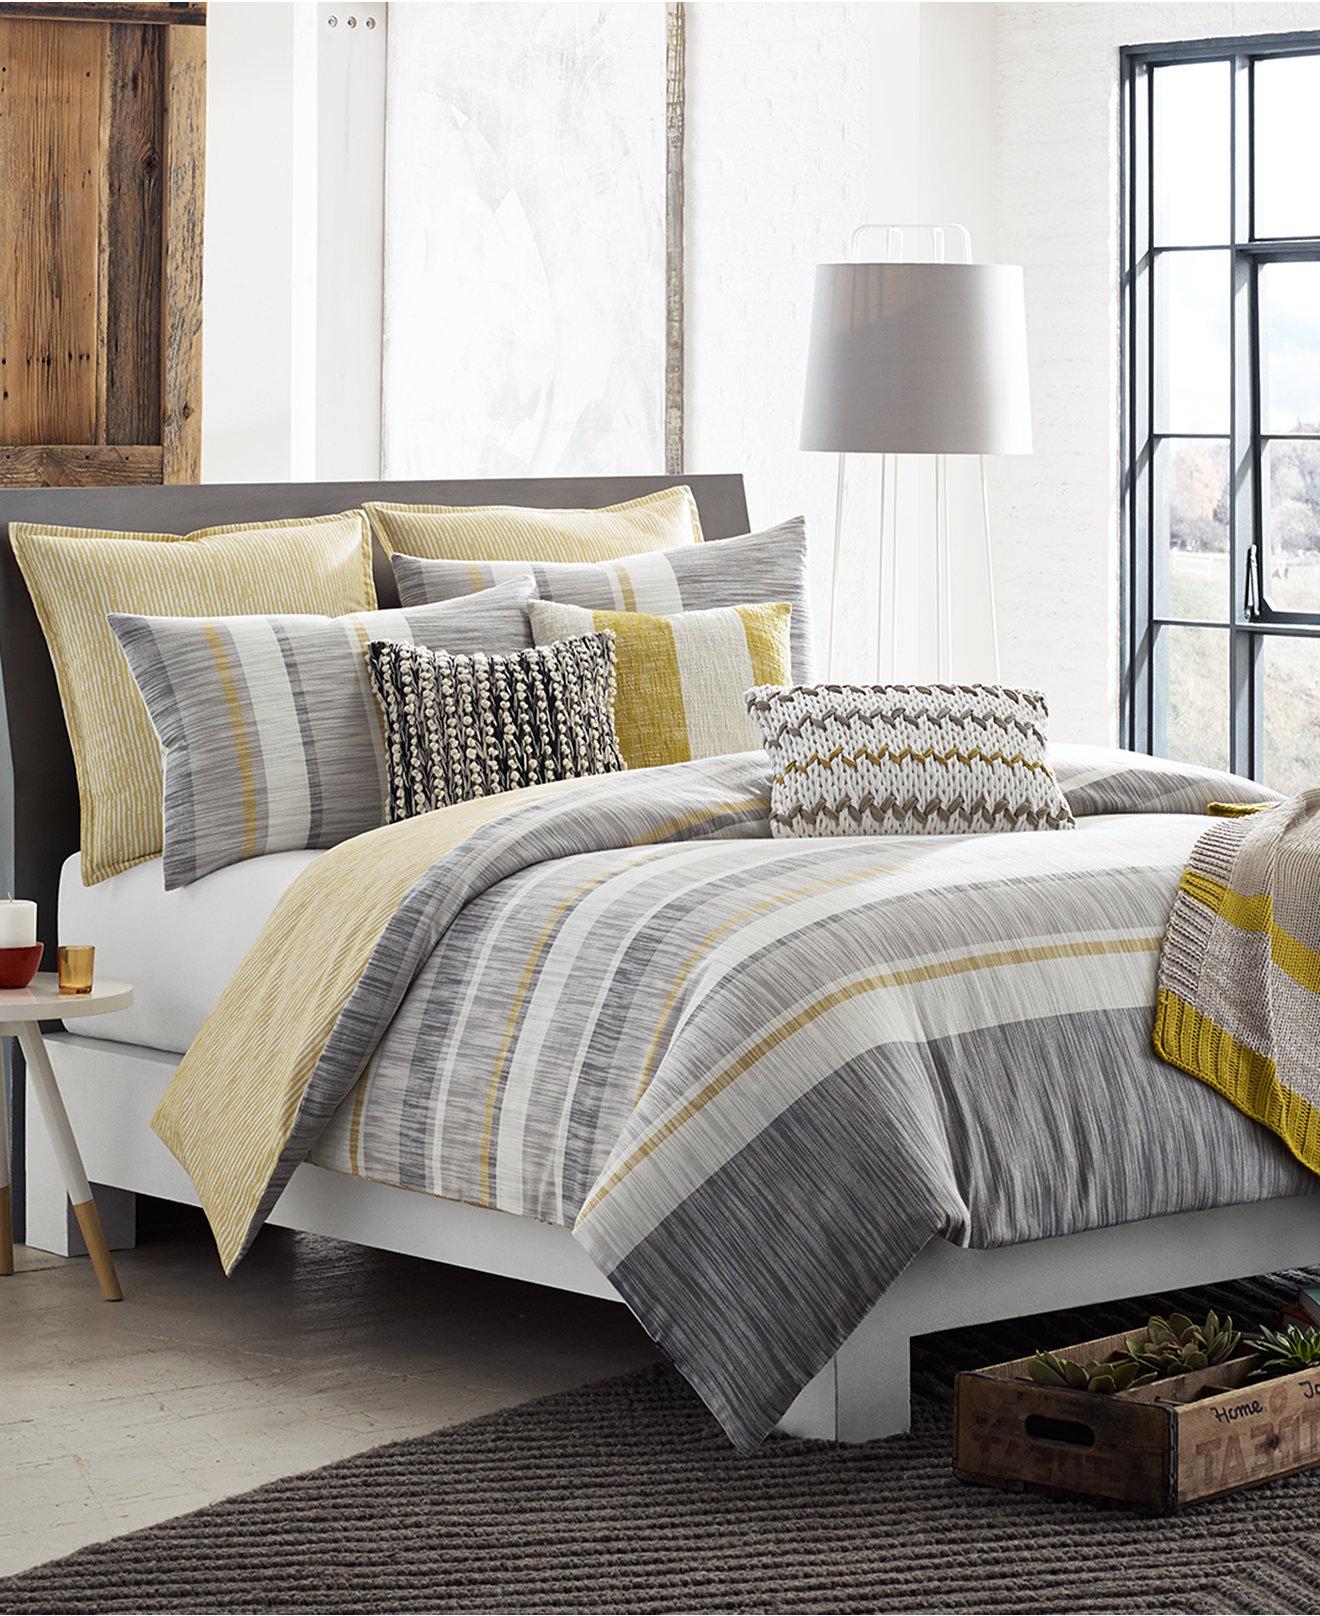 Yellow and grey bedding twin - Kas Room Logan Bedding Collection Collections Bed Grey Yellow